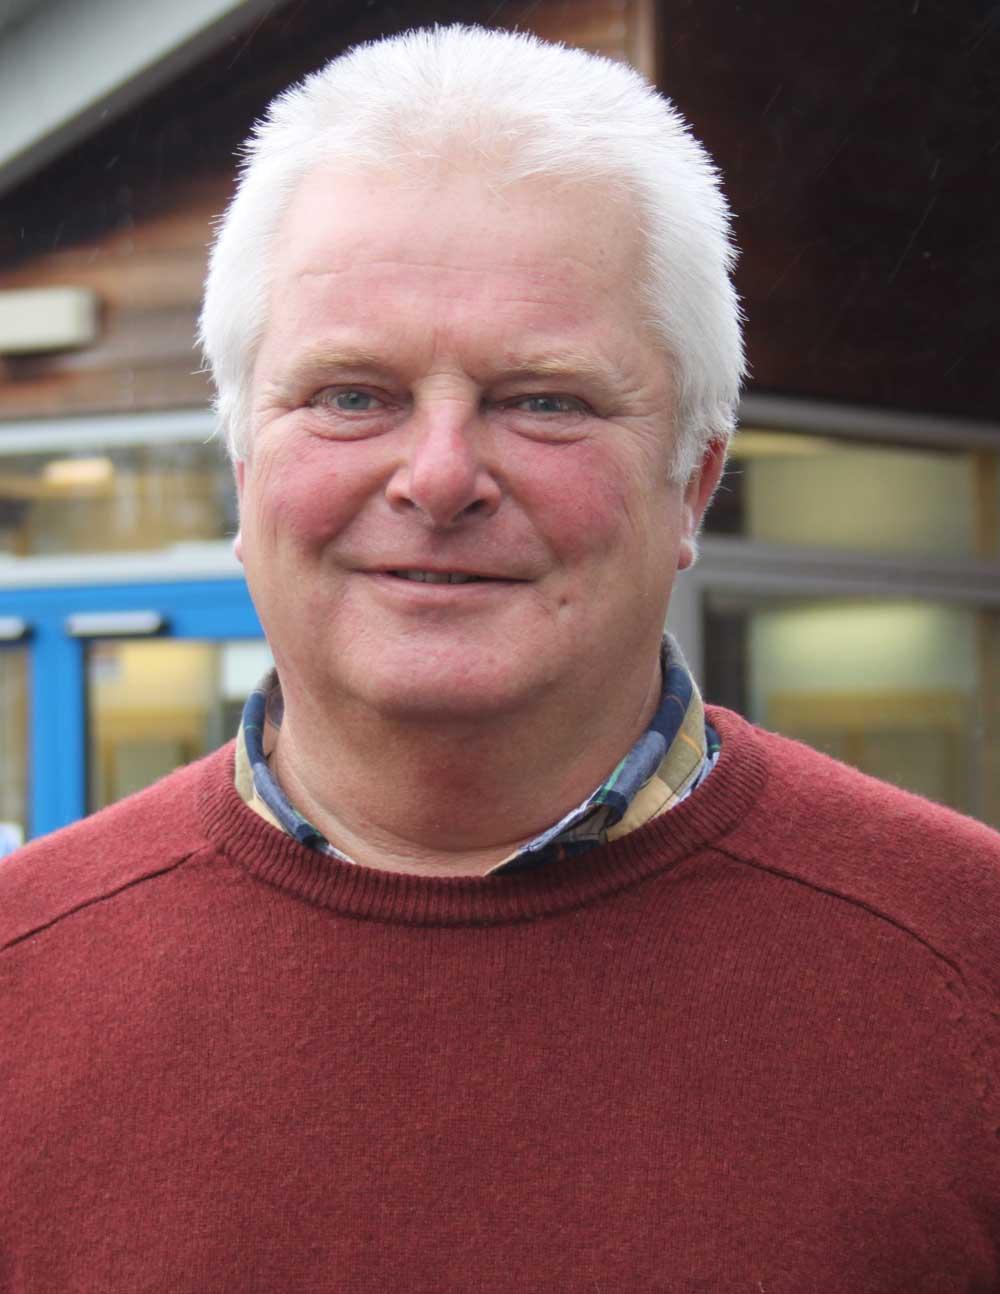 Dave McKittrick